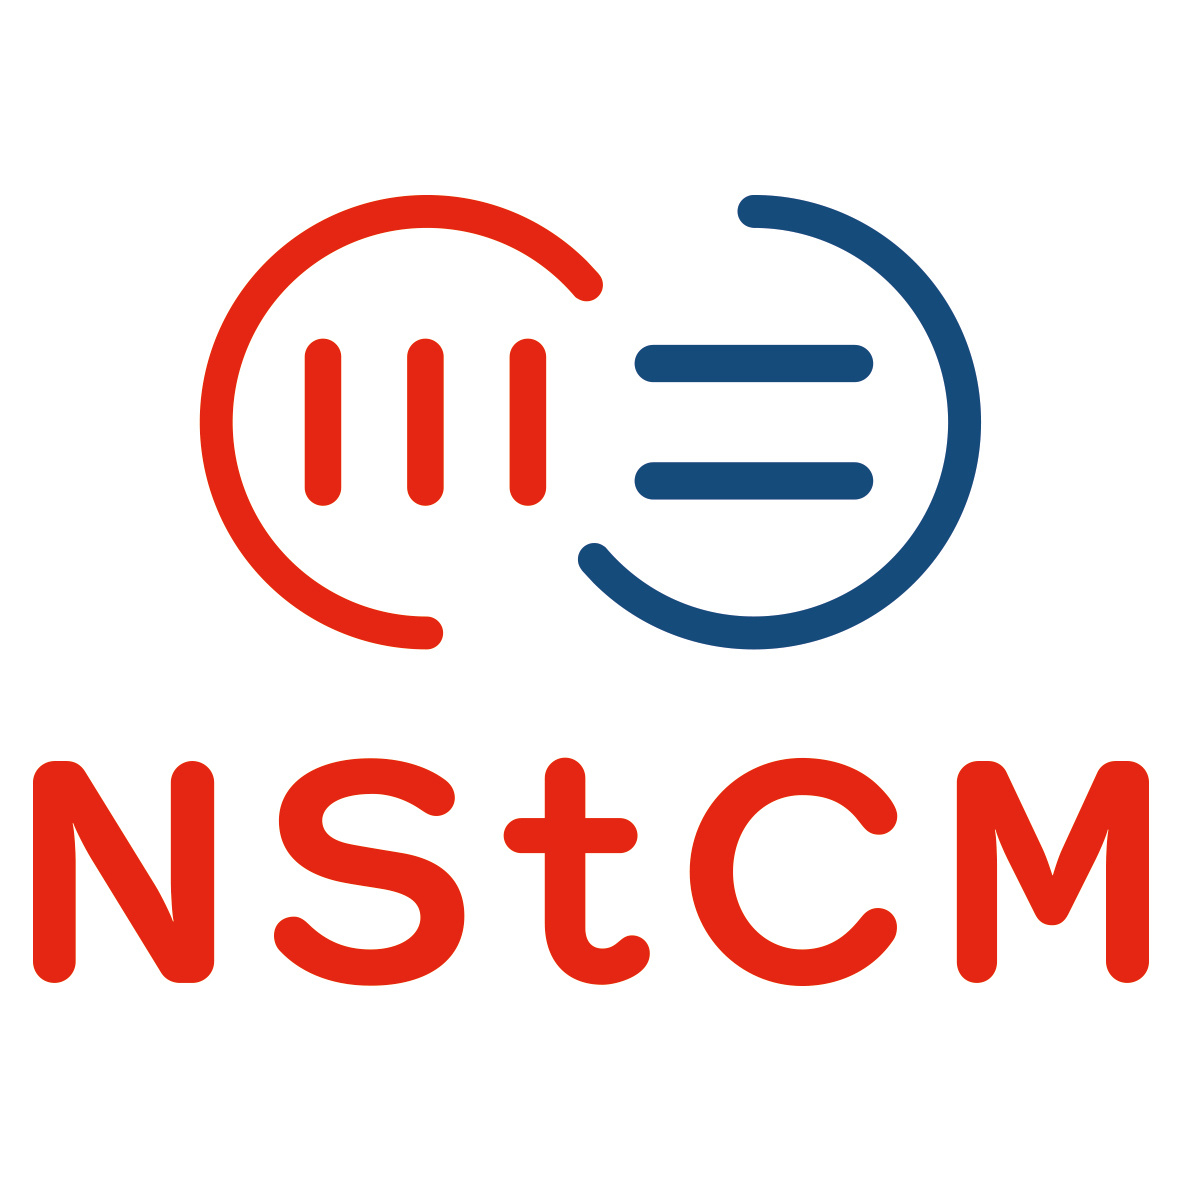 NSTCM_jpg